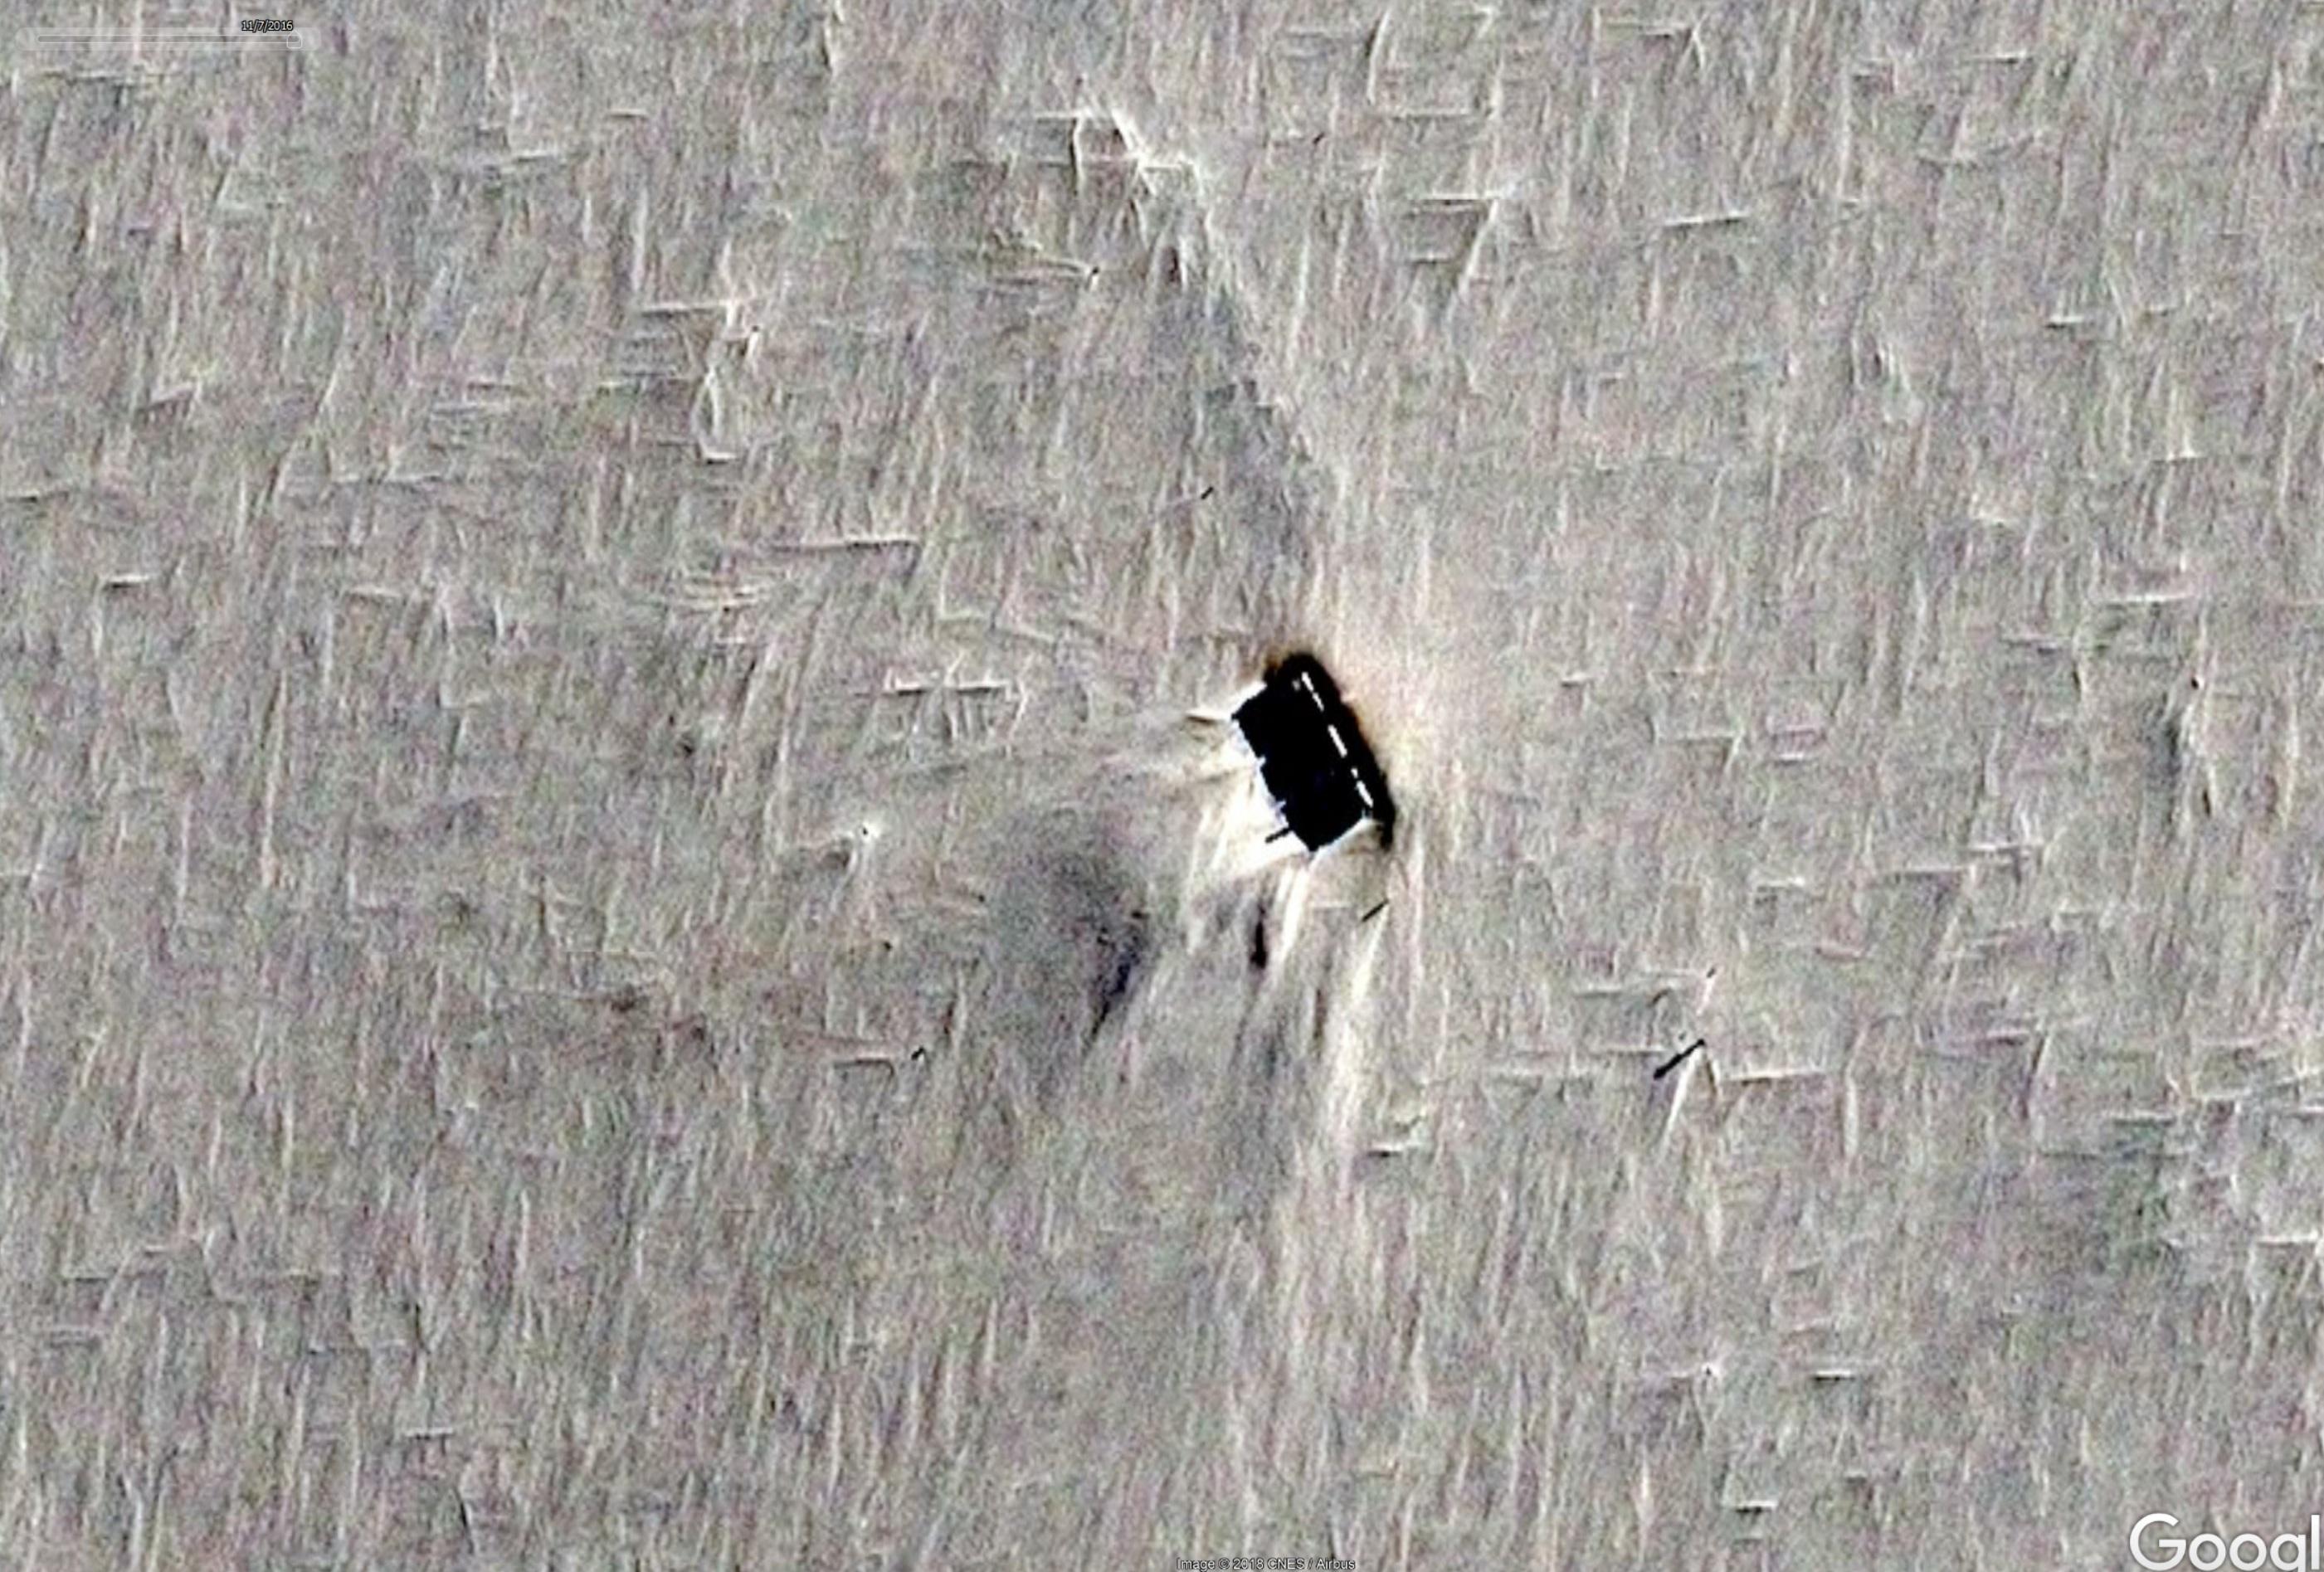 В Антарктиде найден HAARP, построенный Третьим рейхом? Uc5b8b2c4f